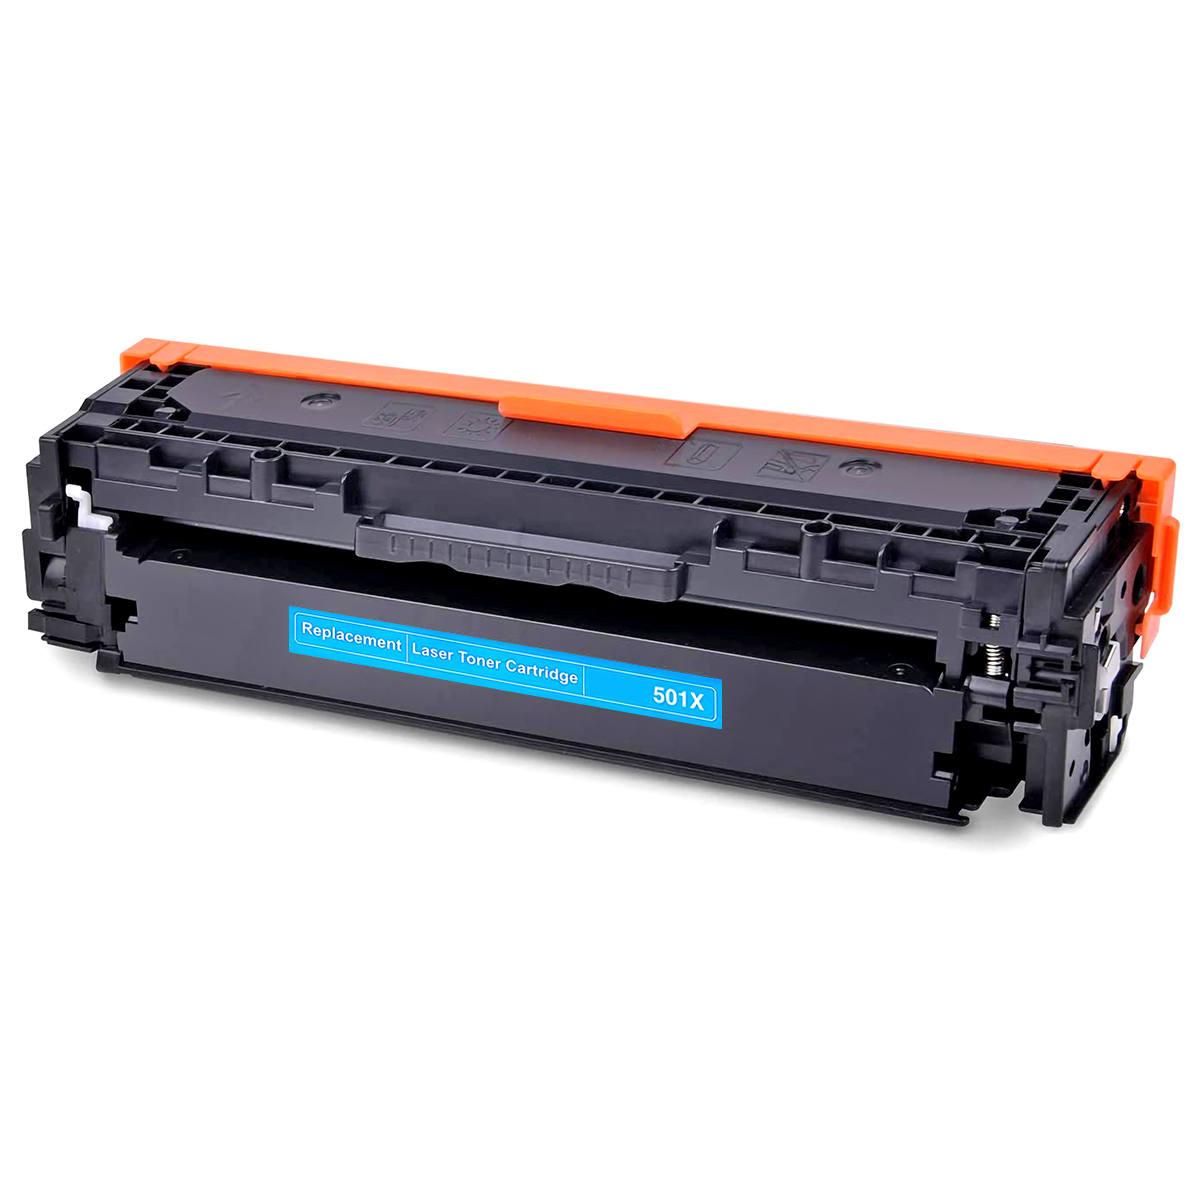 Compatível: Toner CF-501X 202X para Impressora HP M281 M281nw M281cdw M280 M280nw M254 M254dn M254dw Ciano 2.500